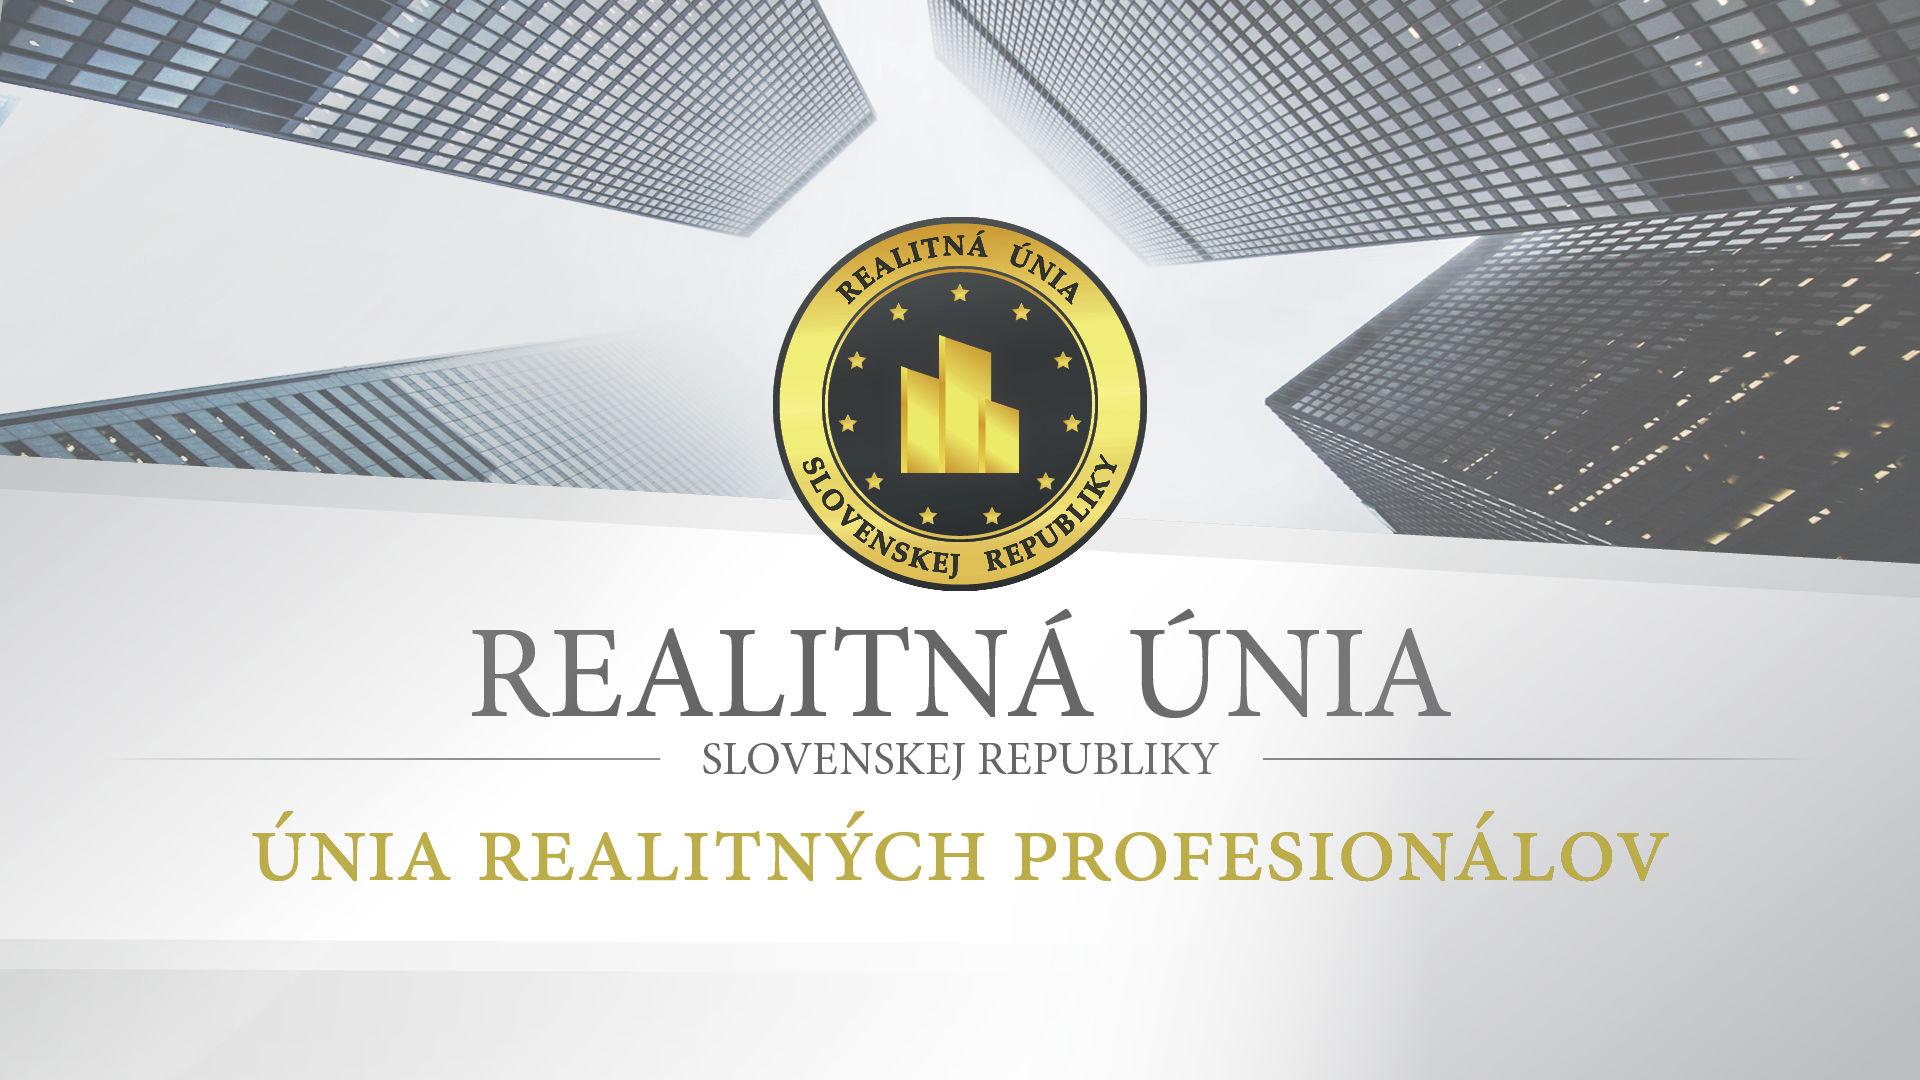 unia realitnych profesionalov